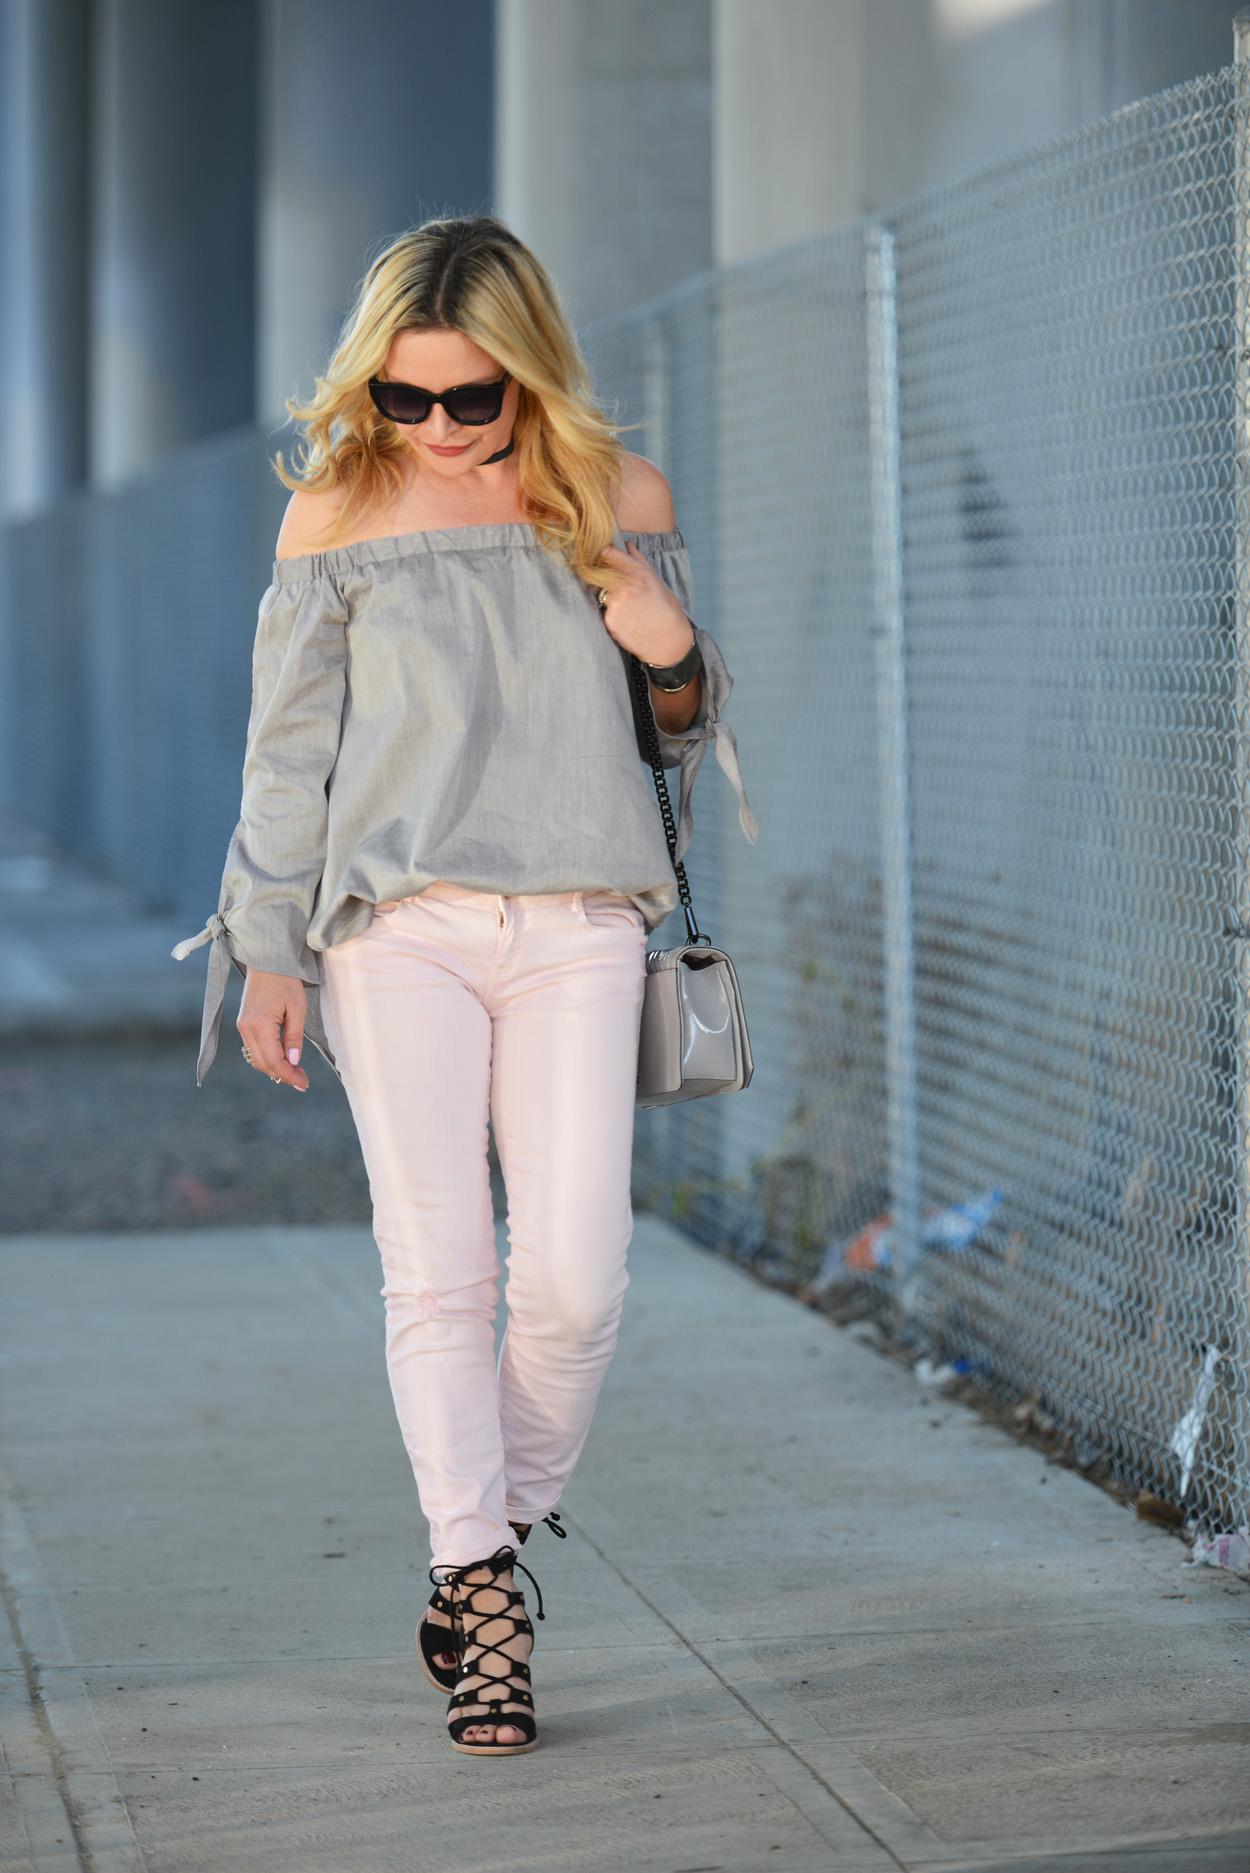 Pink Pockets Chain High Waisted Streetwear Causal Fashion